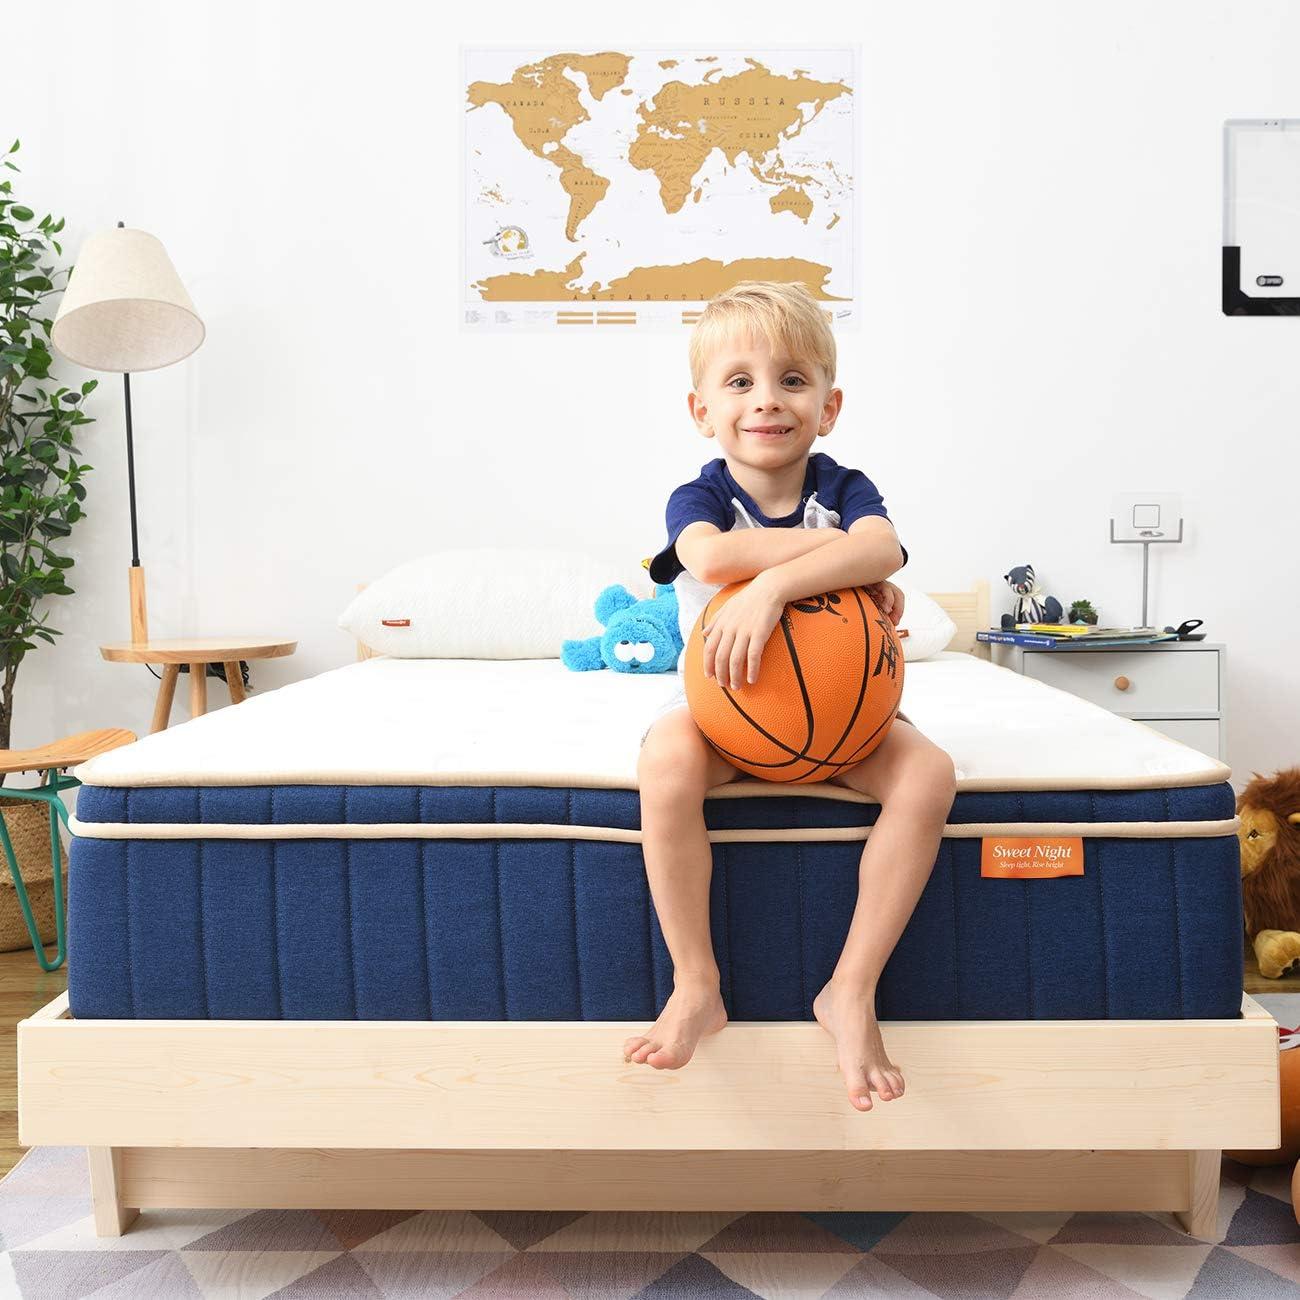 "Sweetnight Ocean Blue 8"" Hybrid Mattress   Gel Memory Foam & Individually Pocket Springs   Full Size: Furniture & Decor"